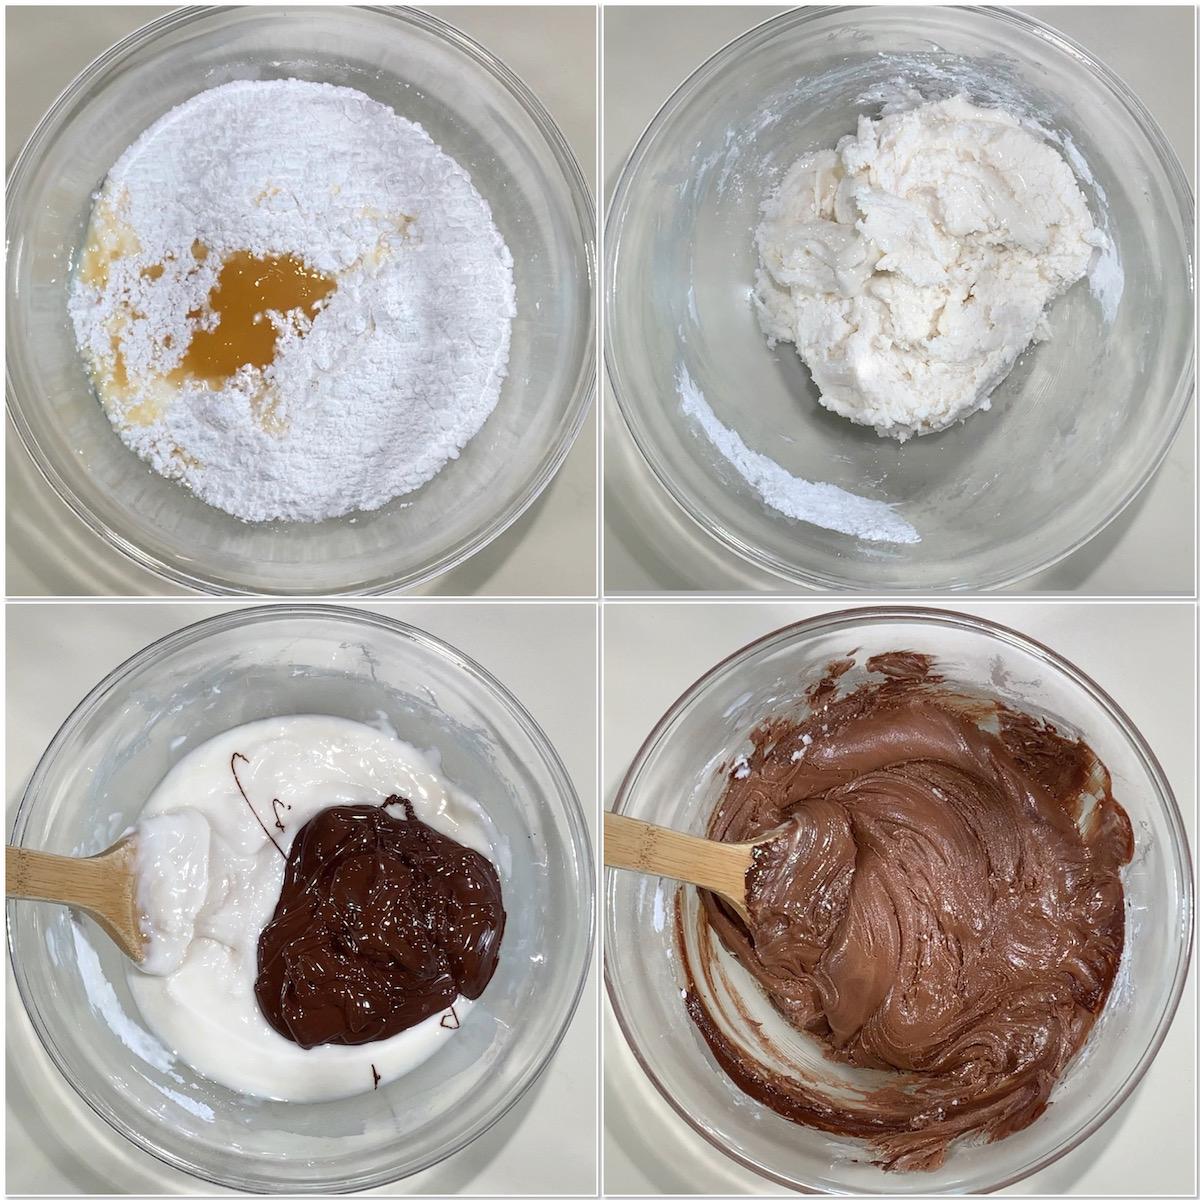 Making dark chocolate whisky fudge collage